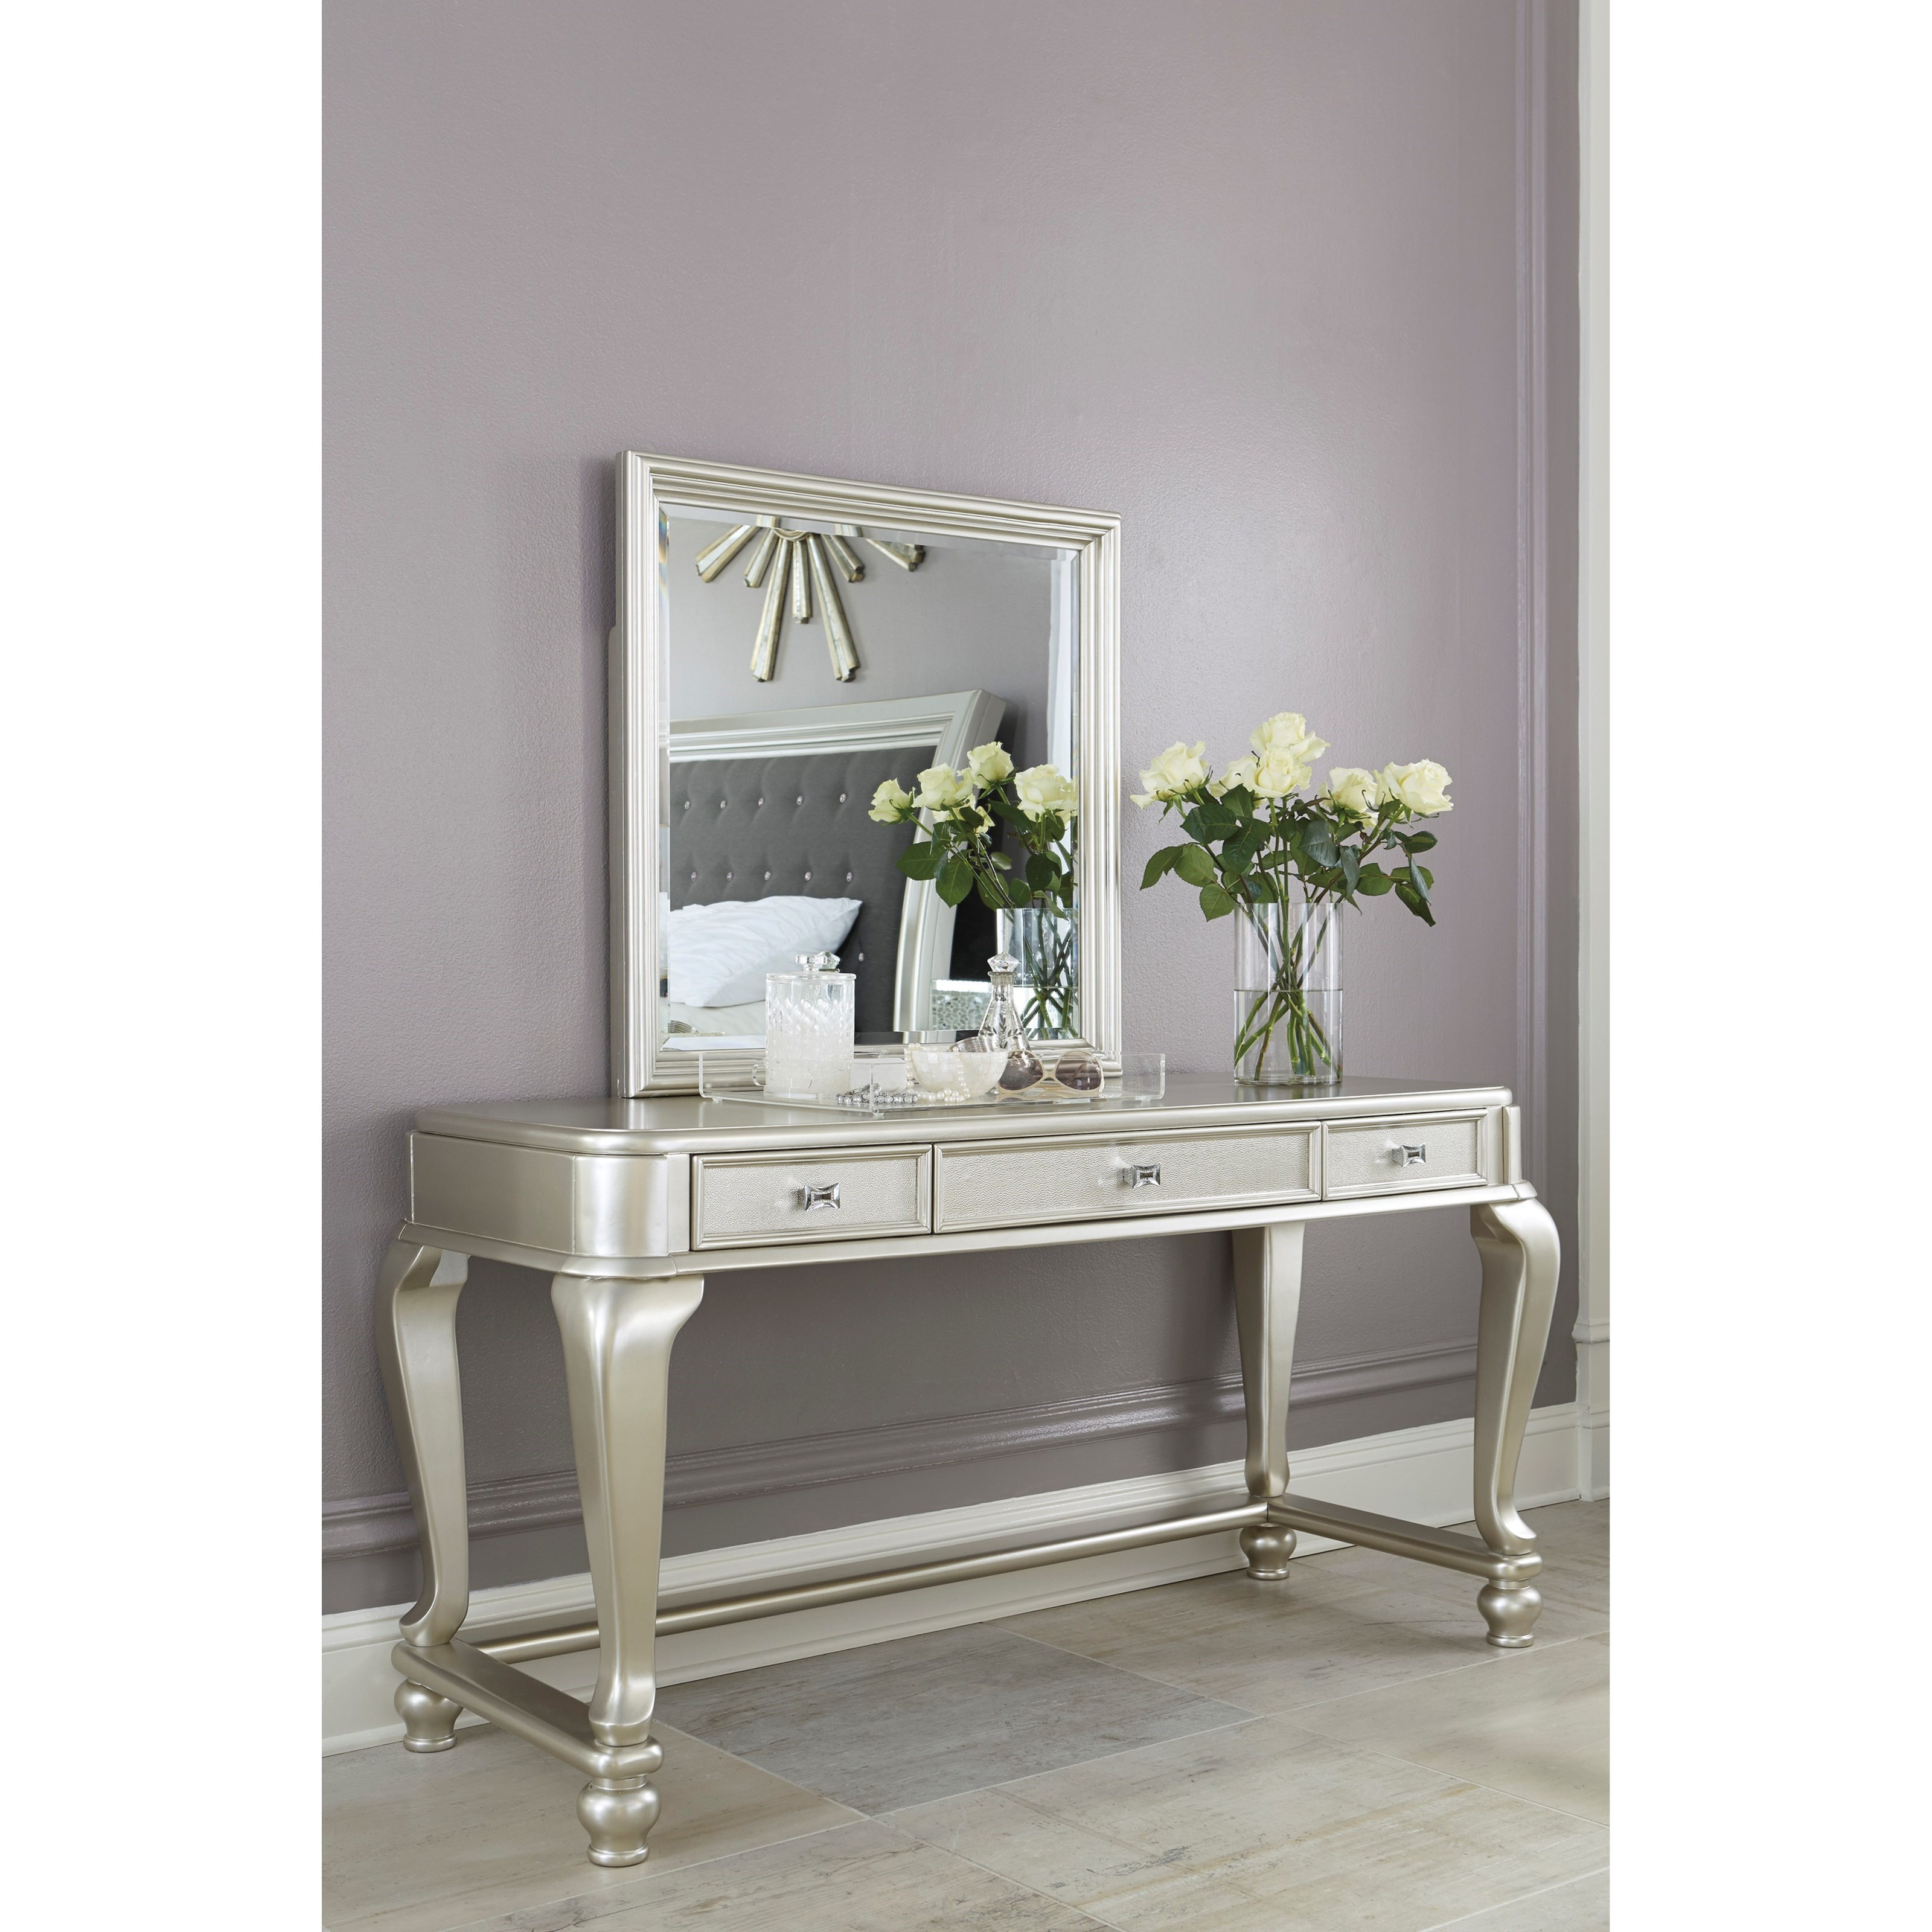 Signature Design by Ashley Coralayne Vanity Mirror - Olindeu0026#39;s Furniture - Dresser Mirrors